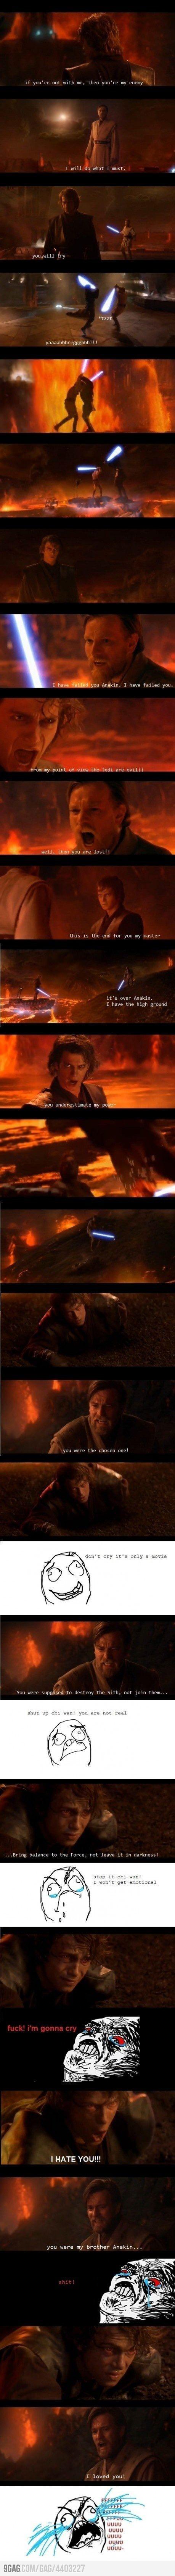 I cried even while reading this... Obi Wan vs. Anakin